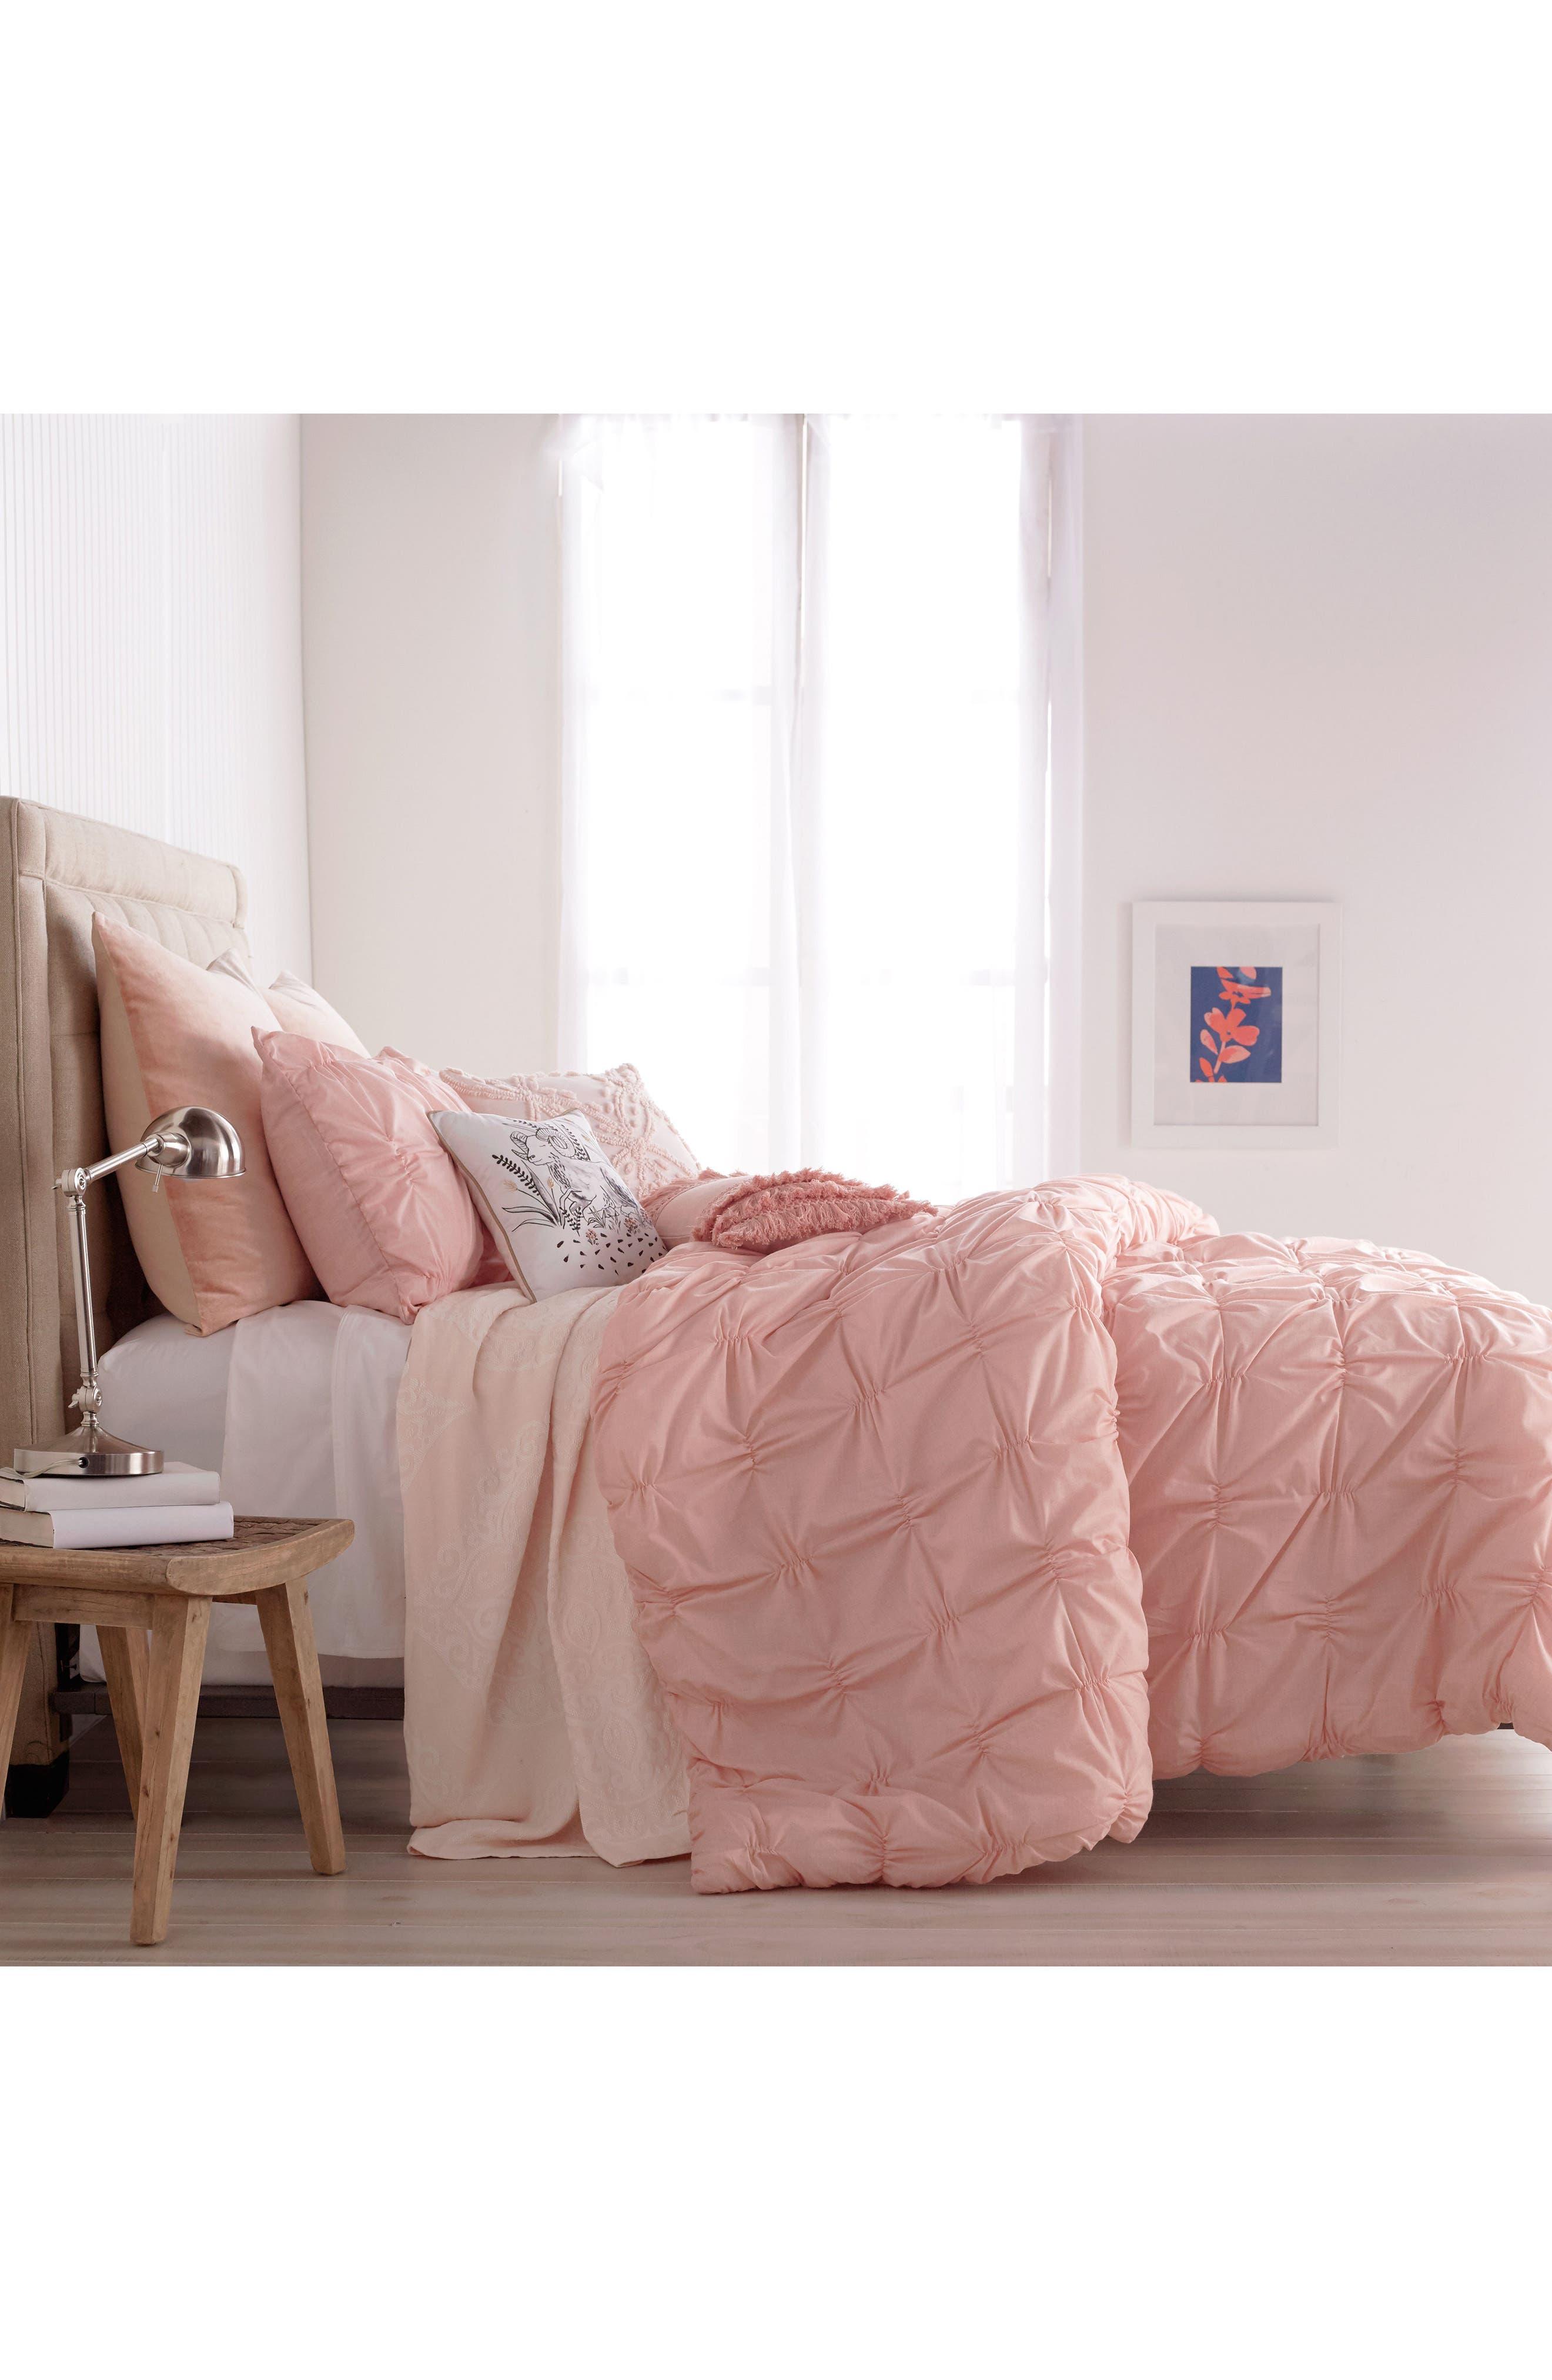 Check Smocked Comforter & Sham Set,                             Alternate thumbnail 2, color,                             Blush